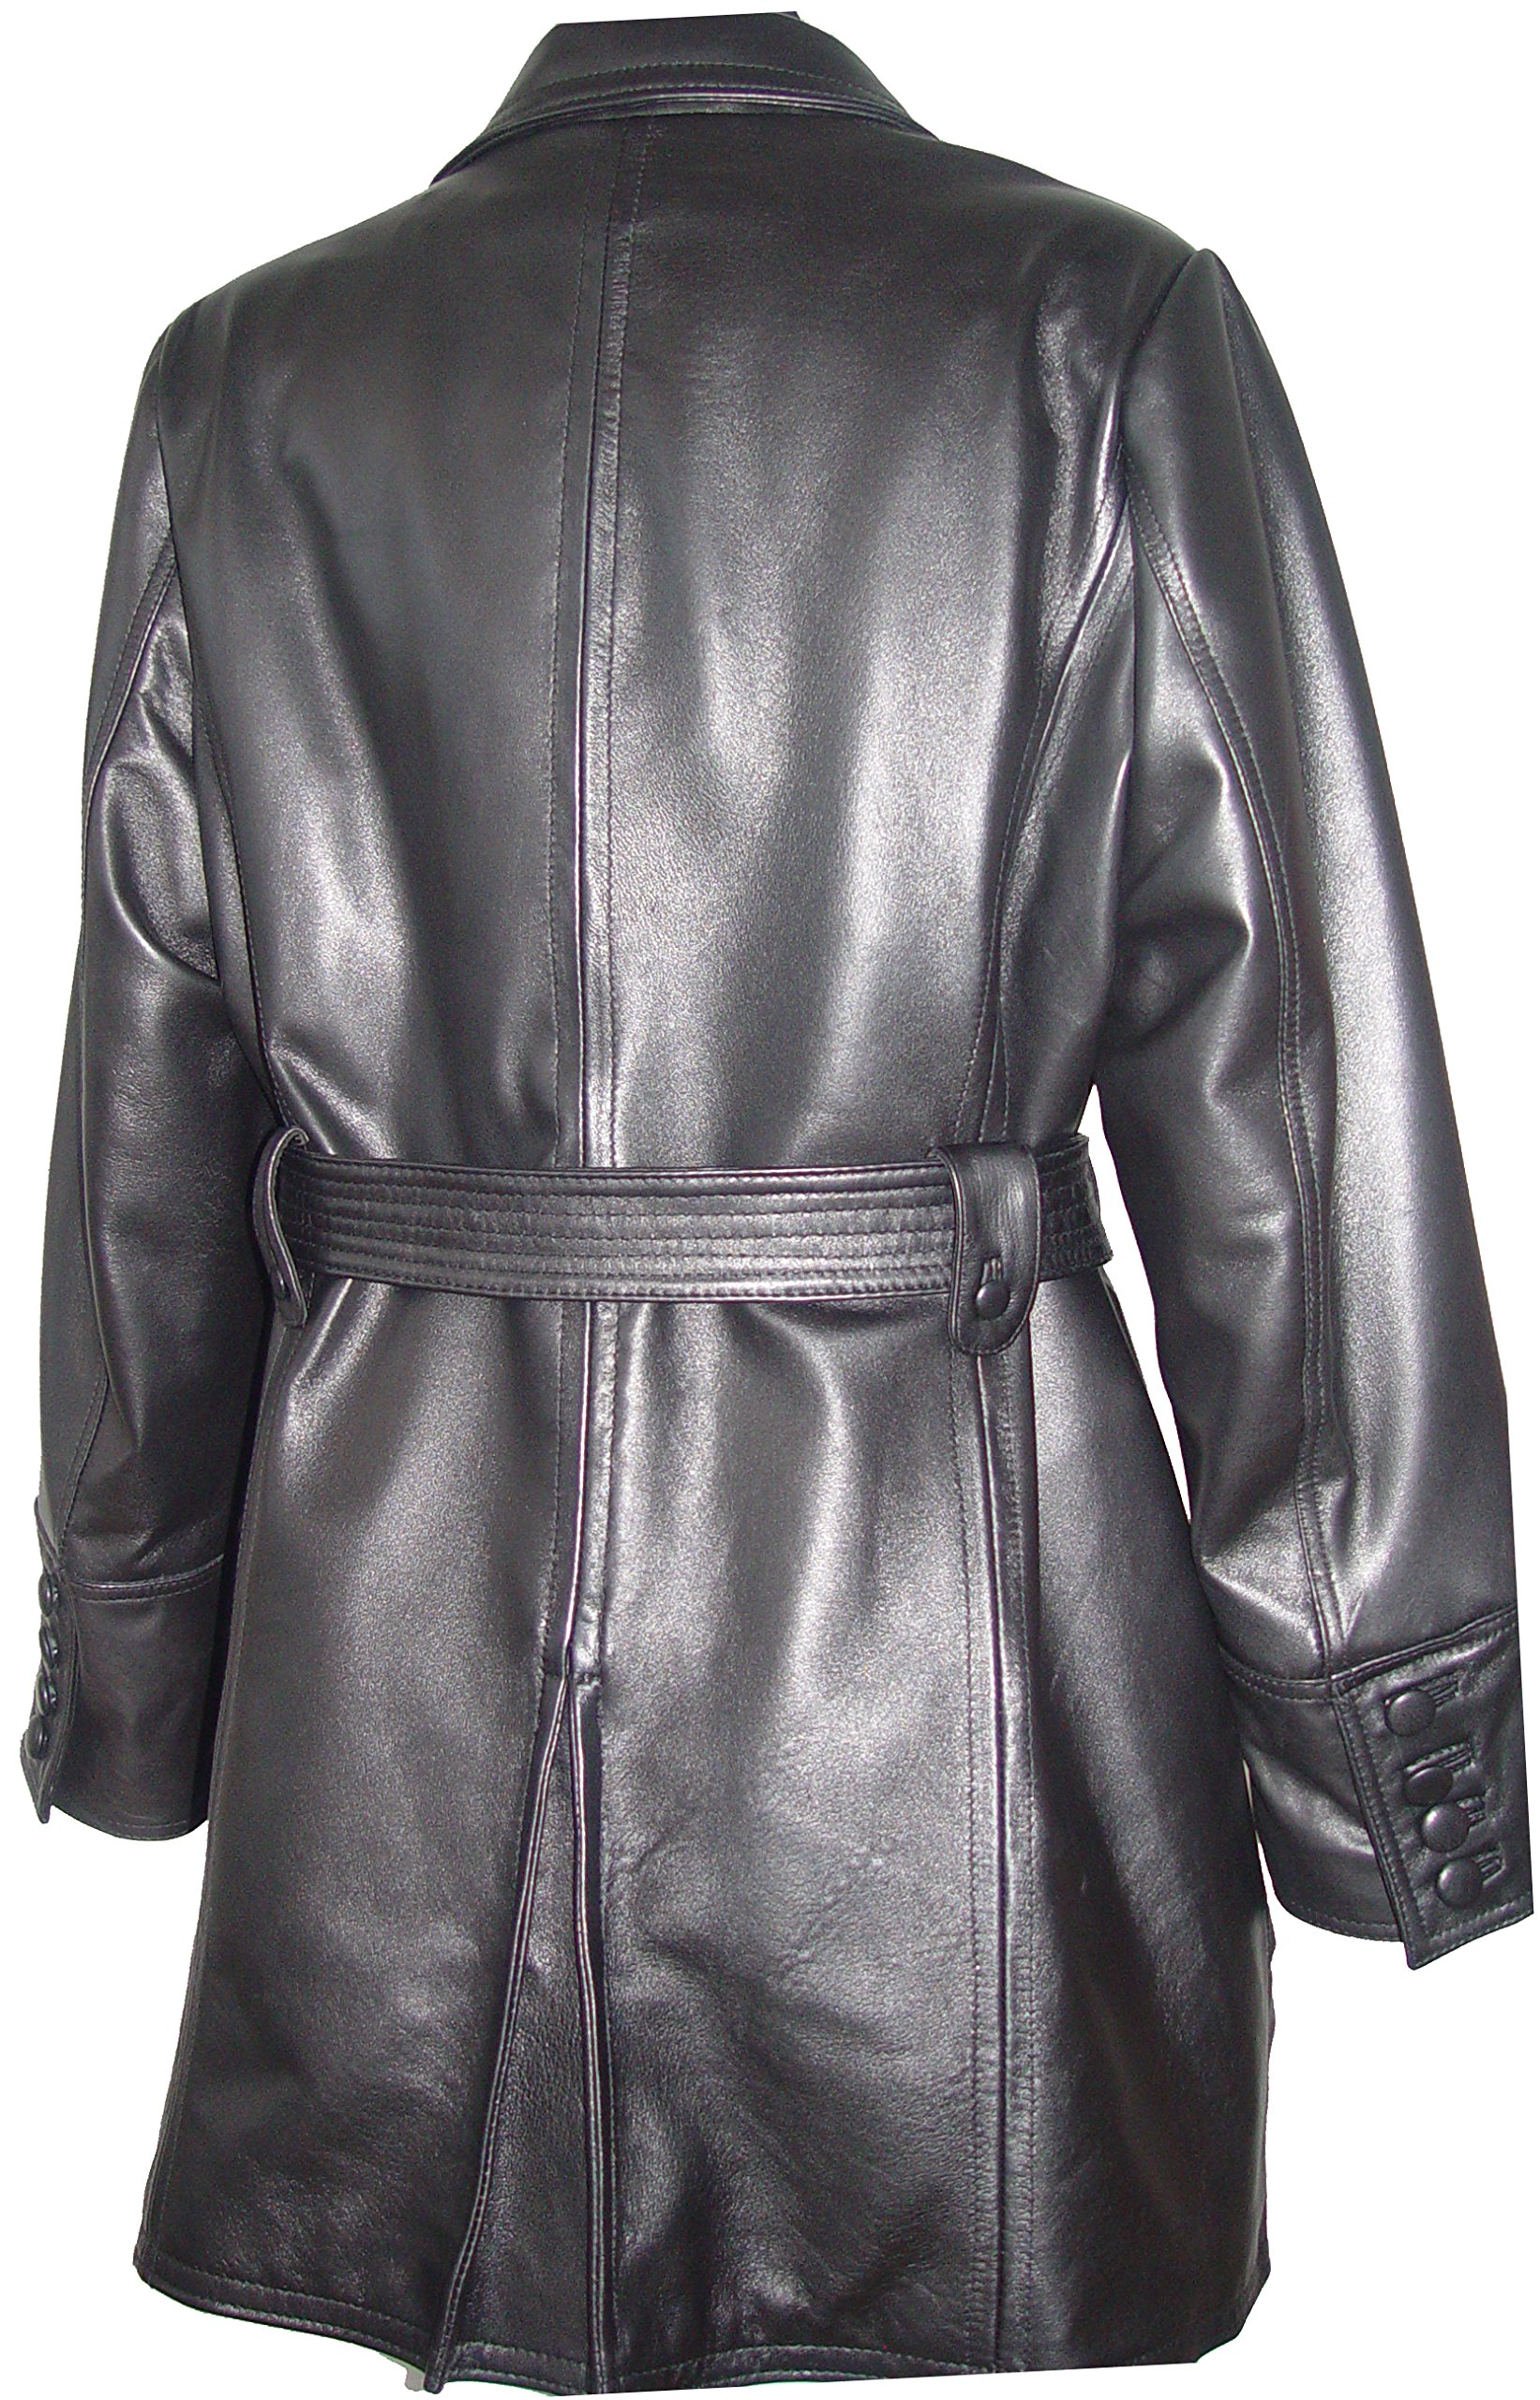 Johnnyblue 4 Season Wear Womens 5006 PETITE & ALL SIZELambskin Leather Trench Coat by Johnnyblue (Image #5)